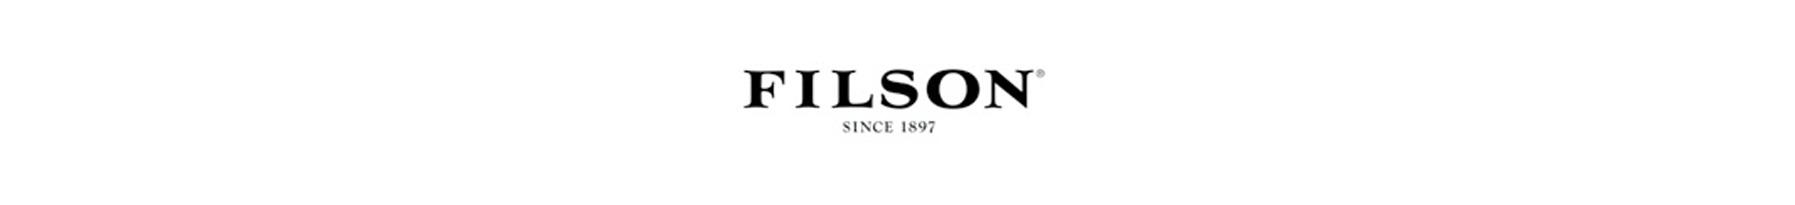 filson_14